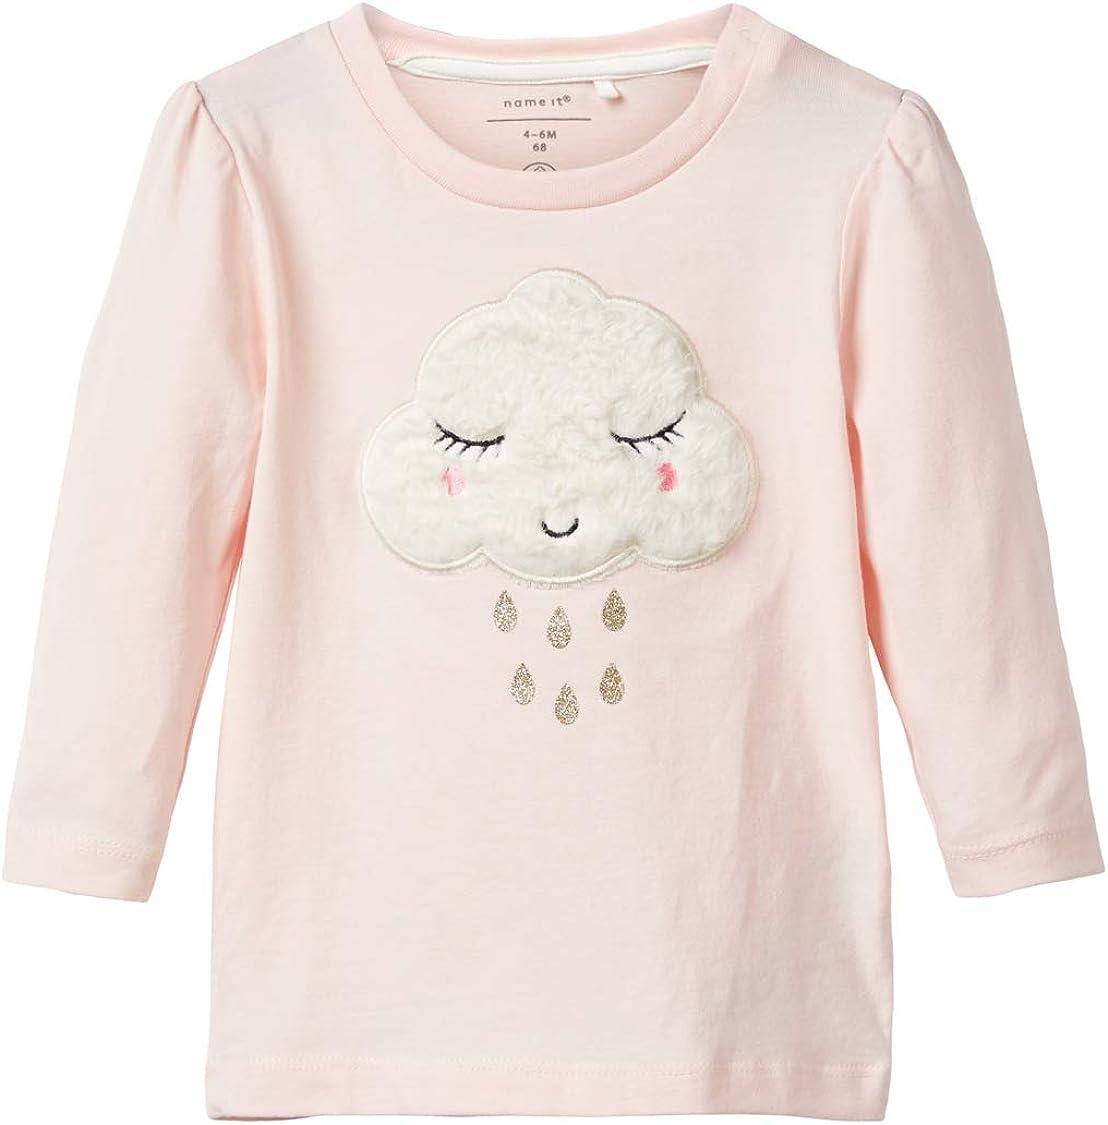 NAME IT Baby M/ädchen Langarmshirt NBFOXANA LS TOP Biobaumwolle